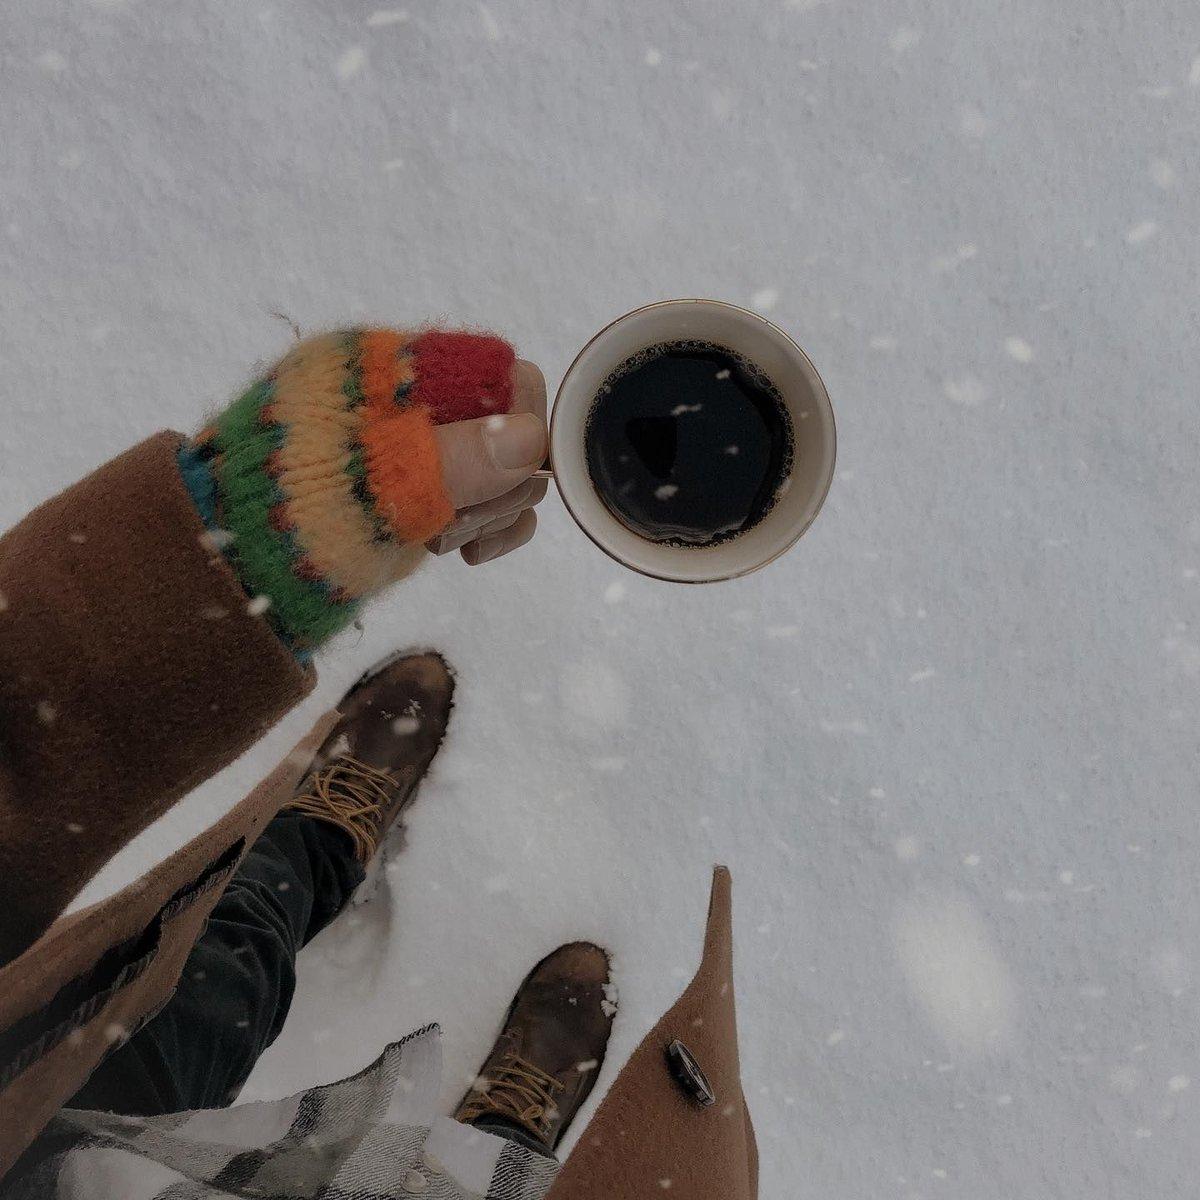 Buzlu kahve isteyen var mı? ❄️☕️   #winterwonderland #winteroutfit #winterishere #still_life_gallery #coldoutside #colddays #snowday #snowwhite #influencermarketinghub #winter #snow #cold #ice #still_life #coffee #gününkahvesi #karlıyollar